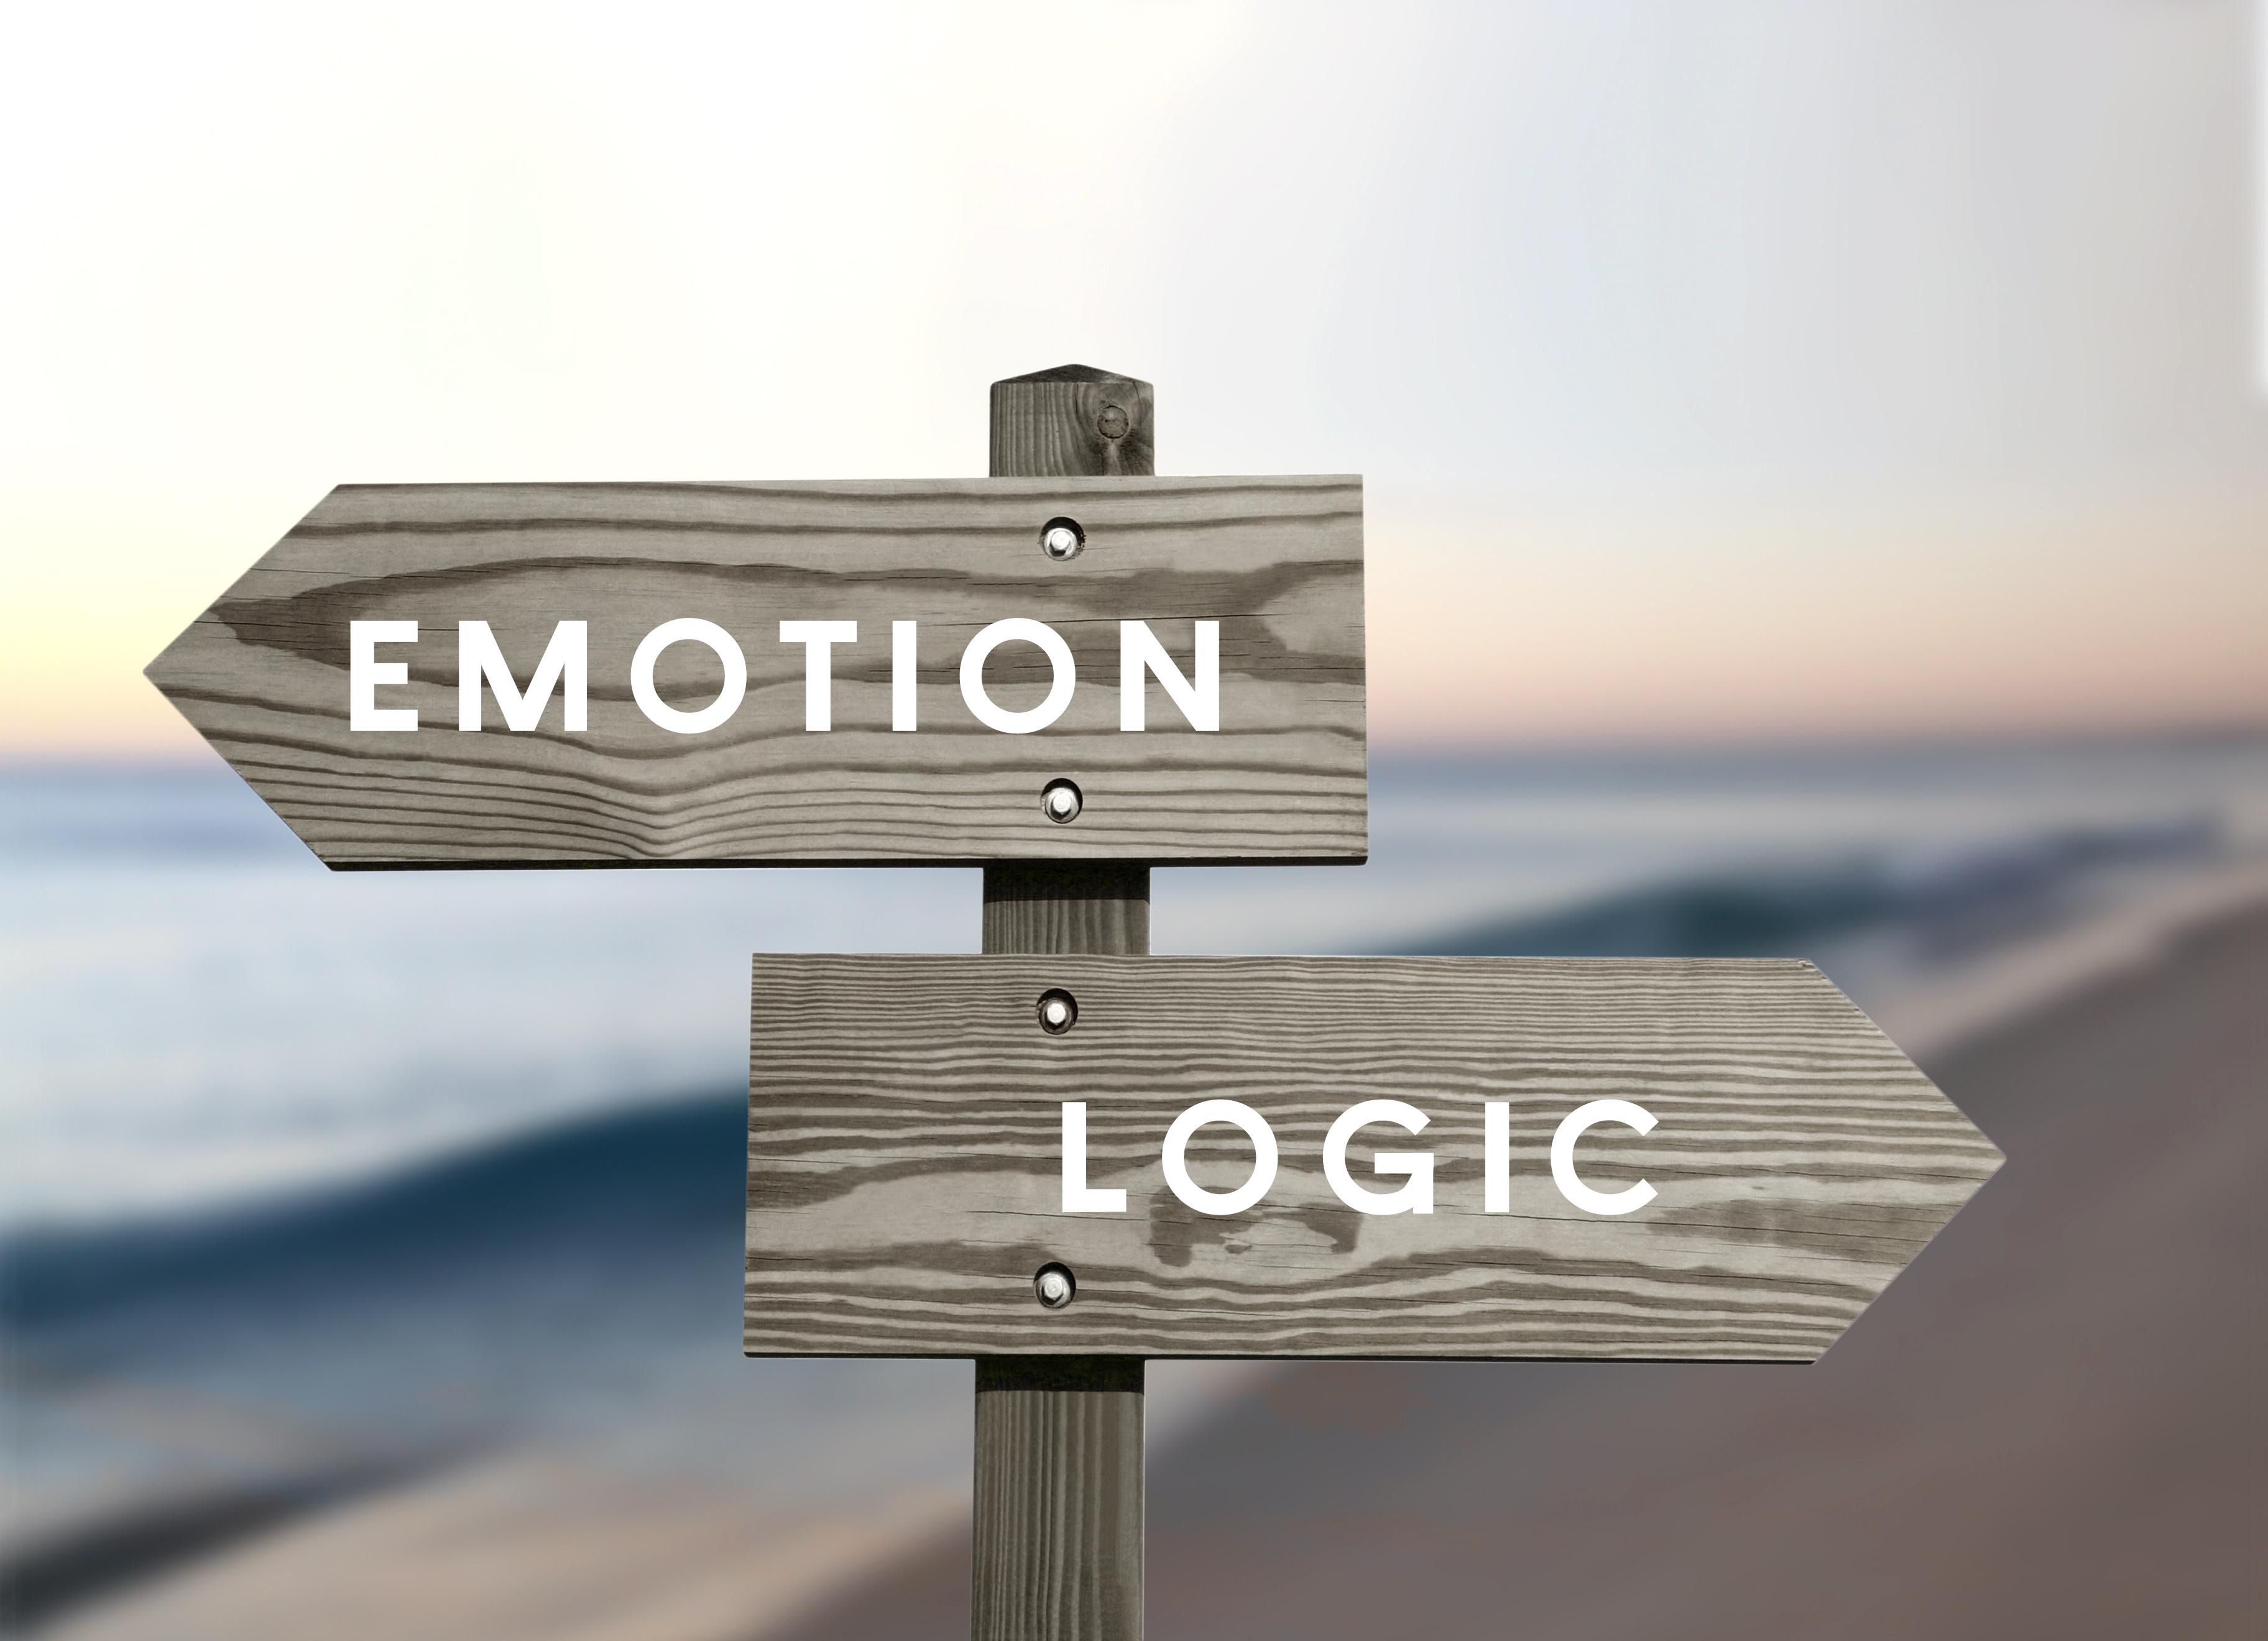 Emotion versus logic opposite direction